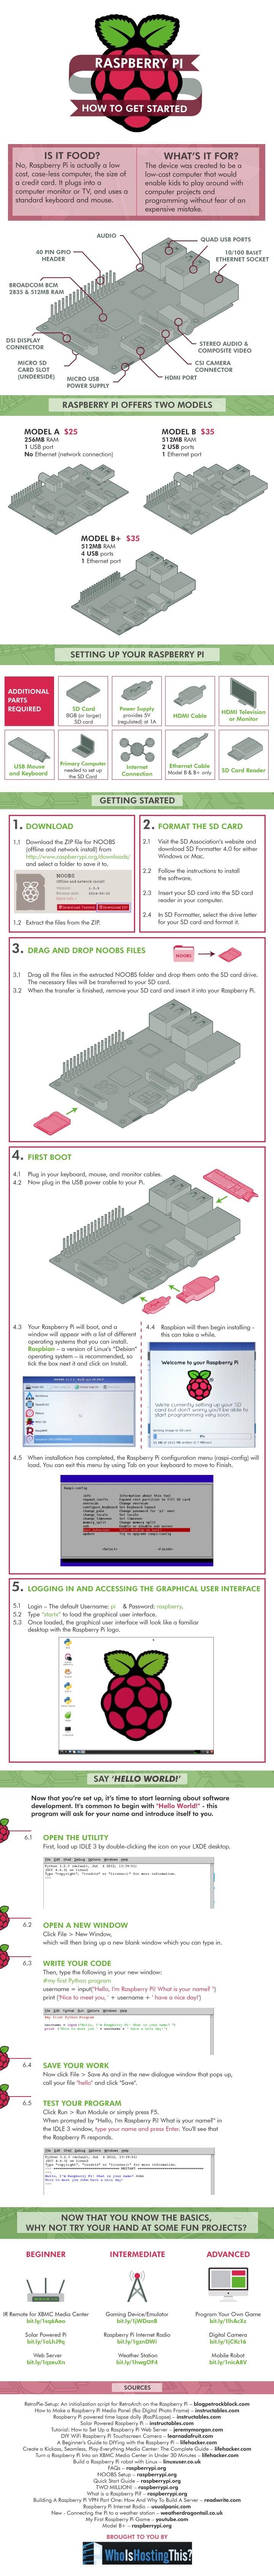 So nimmst du deinen Raspberry Pi in Betrieb